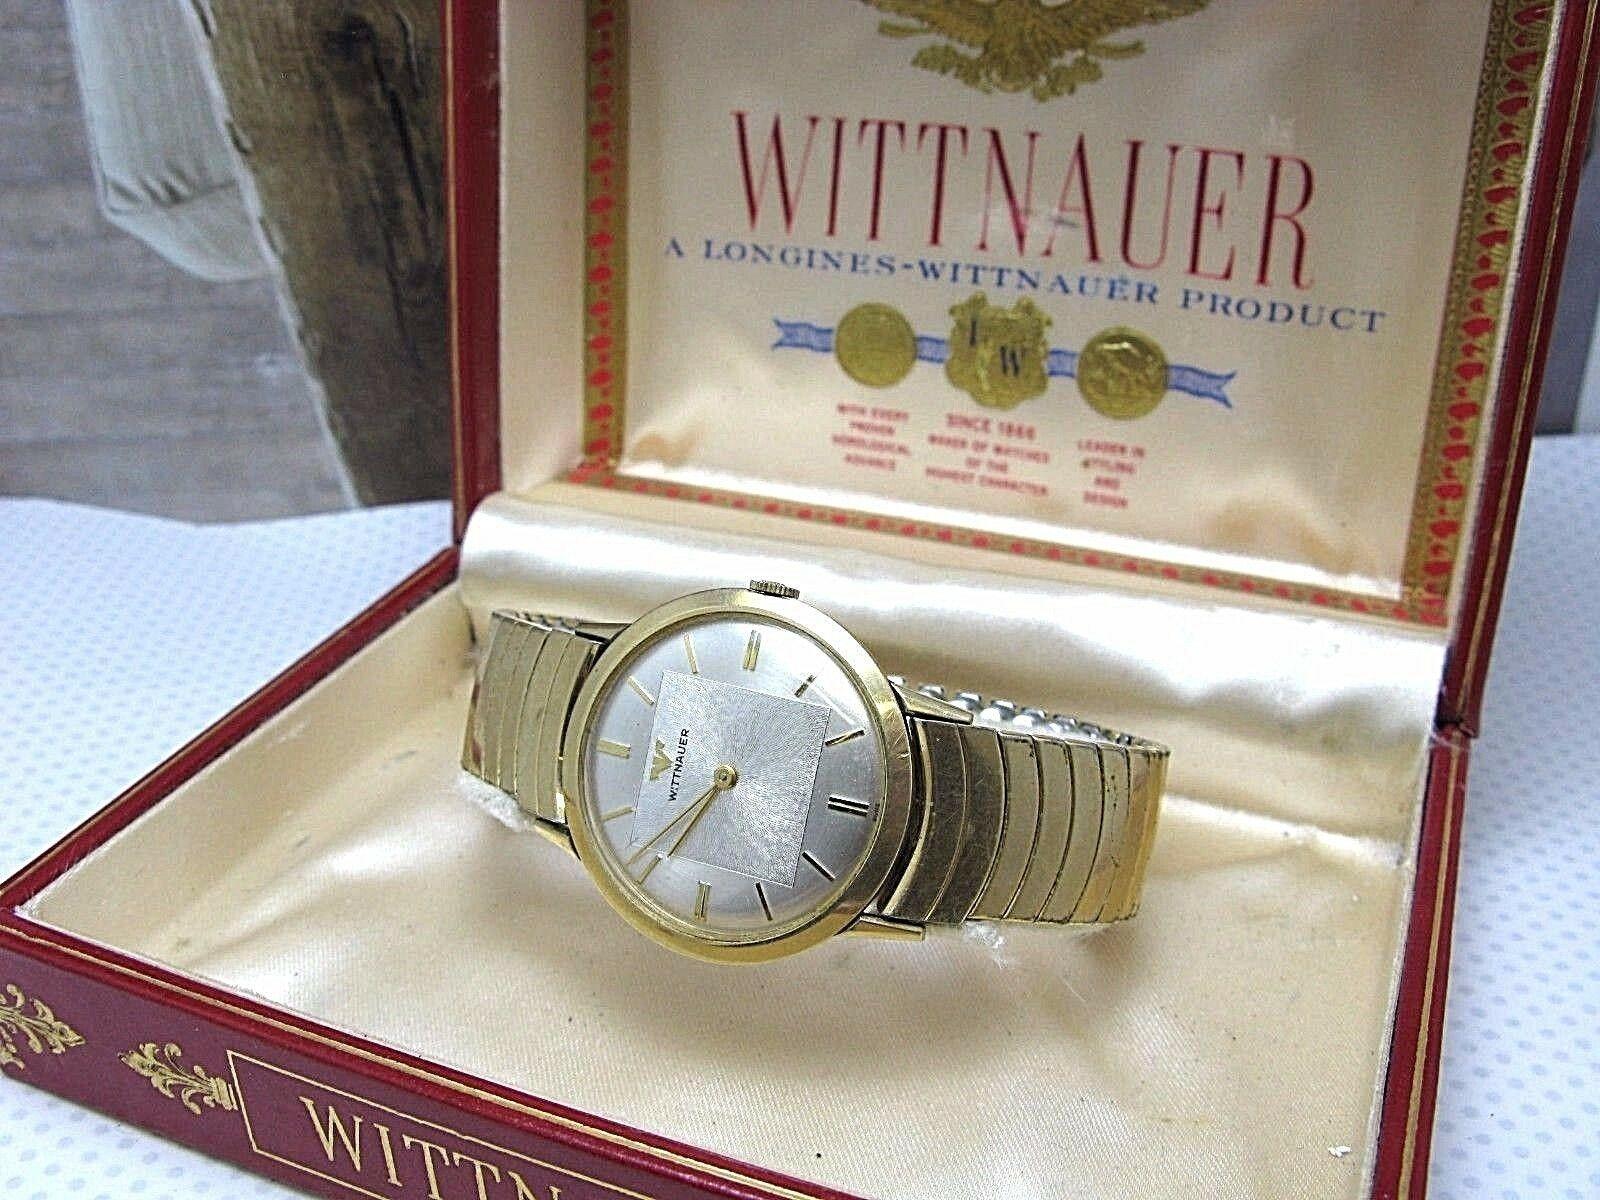 WITTNAUER LONGINE PRODUCT VINTAGE WATCH 1950'S 10K GF APEX BOX